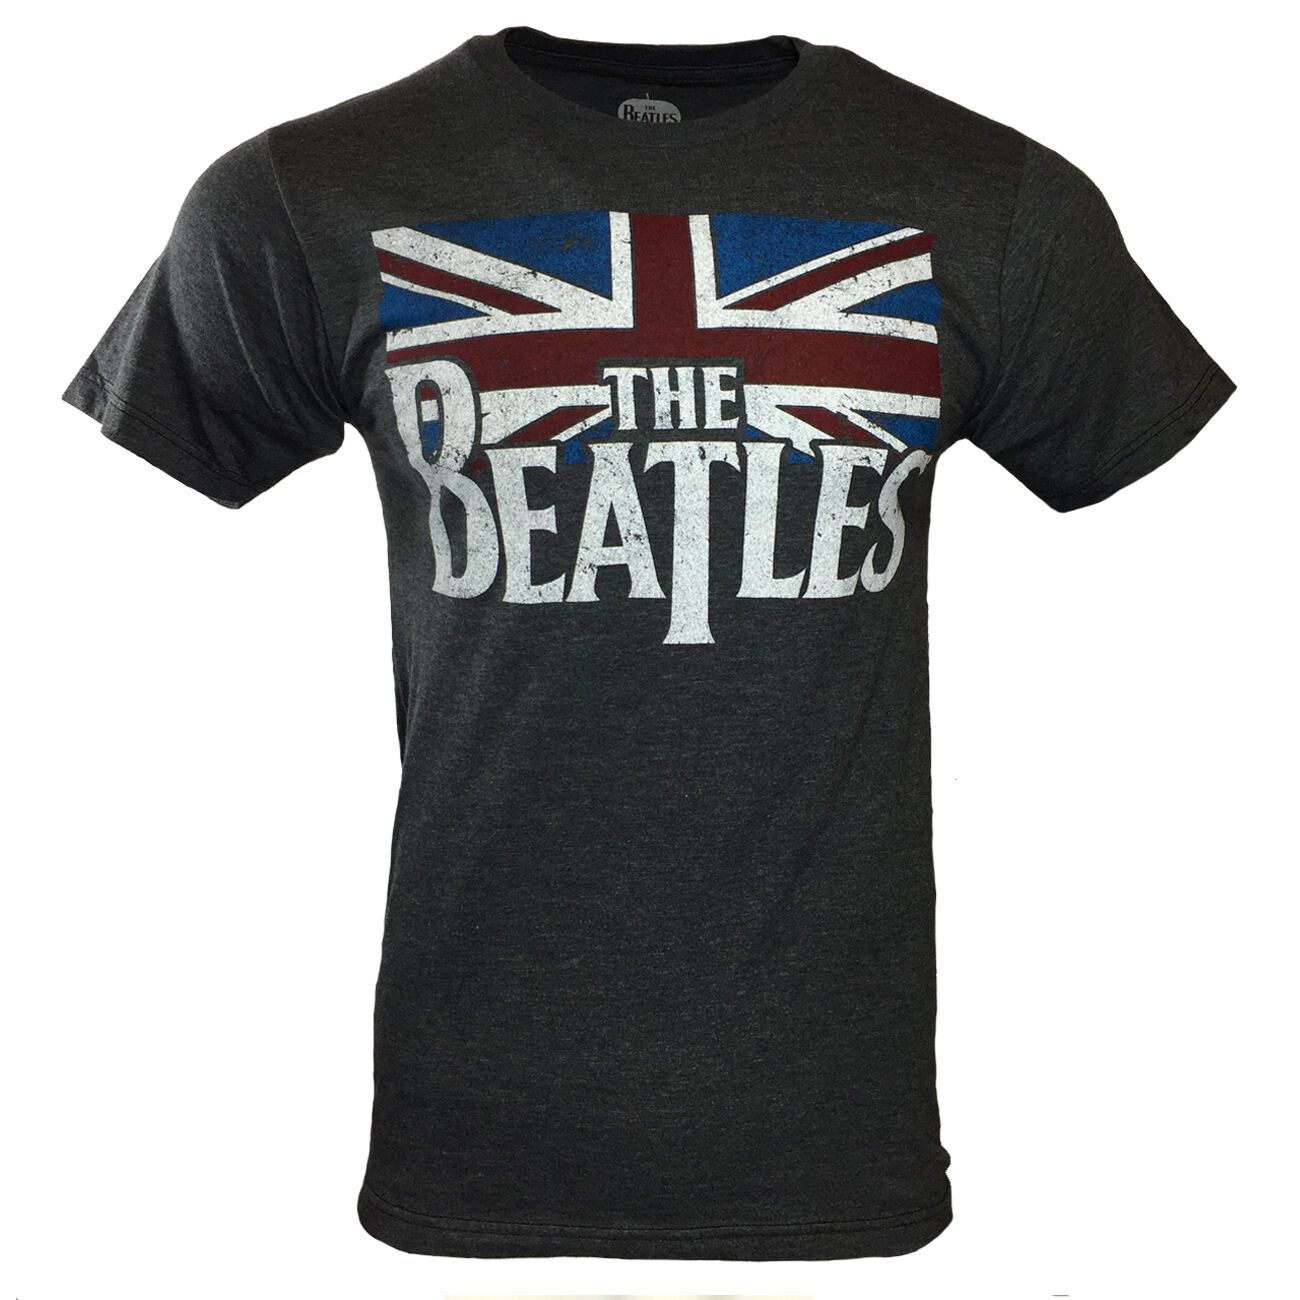 THE BEATLES Men Tee T Shirt John Lennon Rock Band Logo